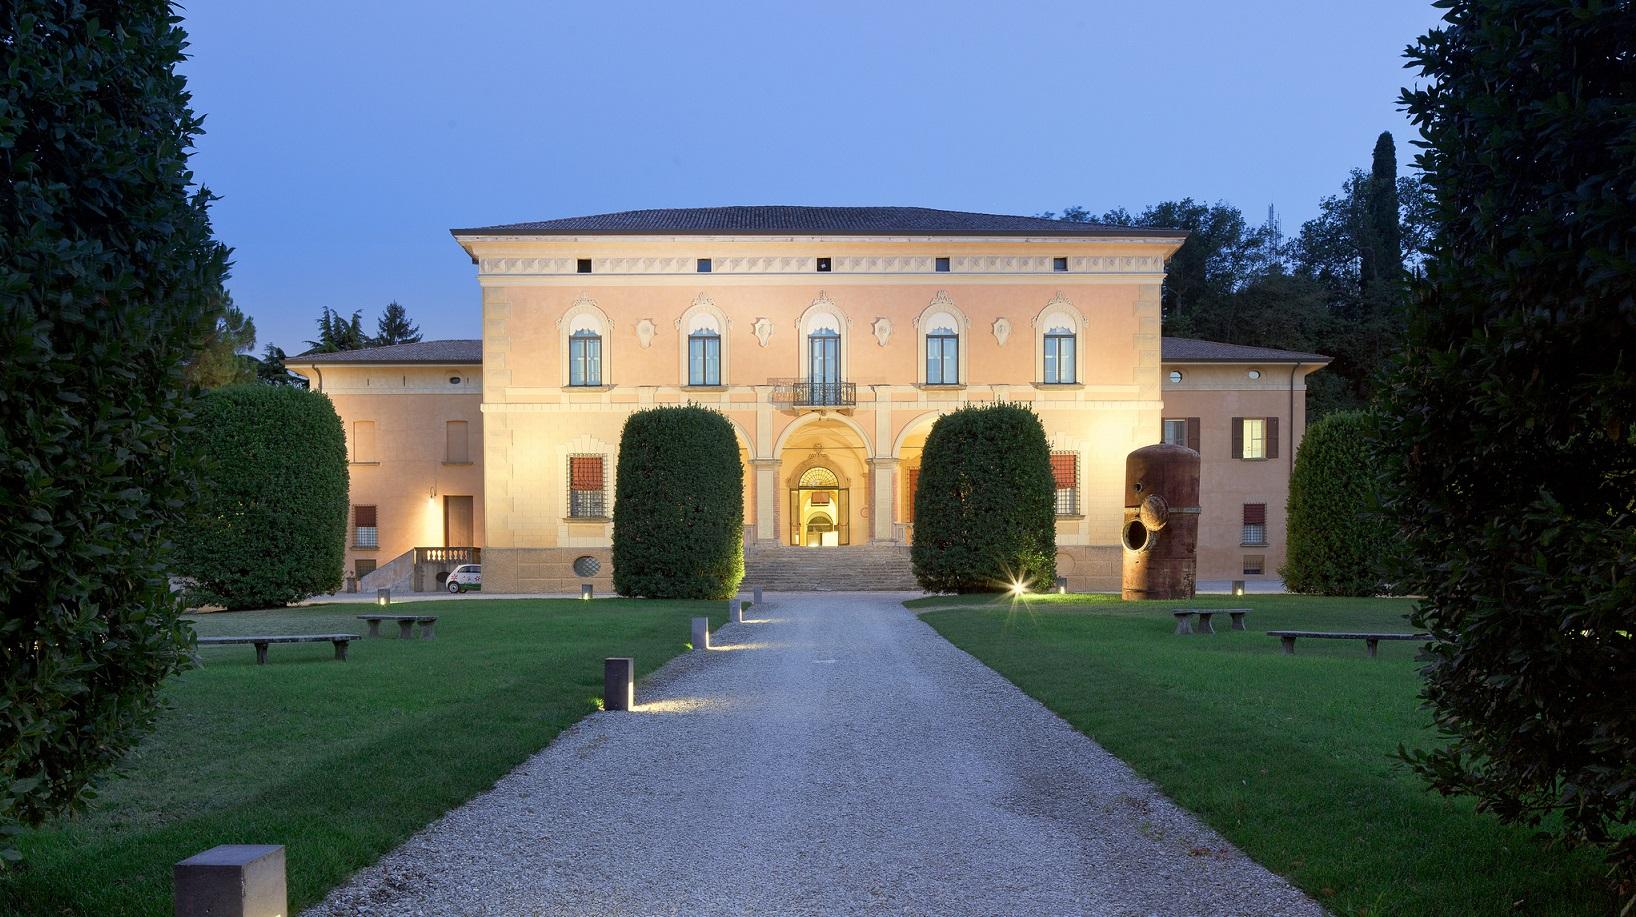 Villa Guastavillani, sede della BBS